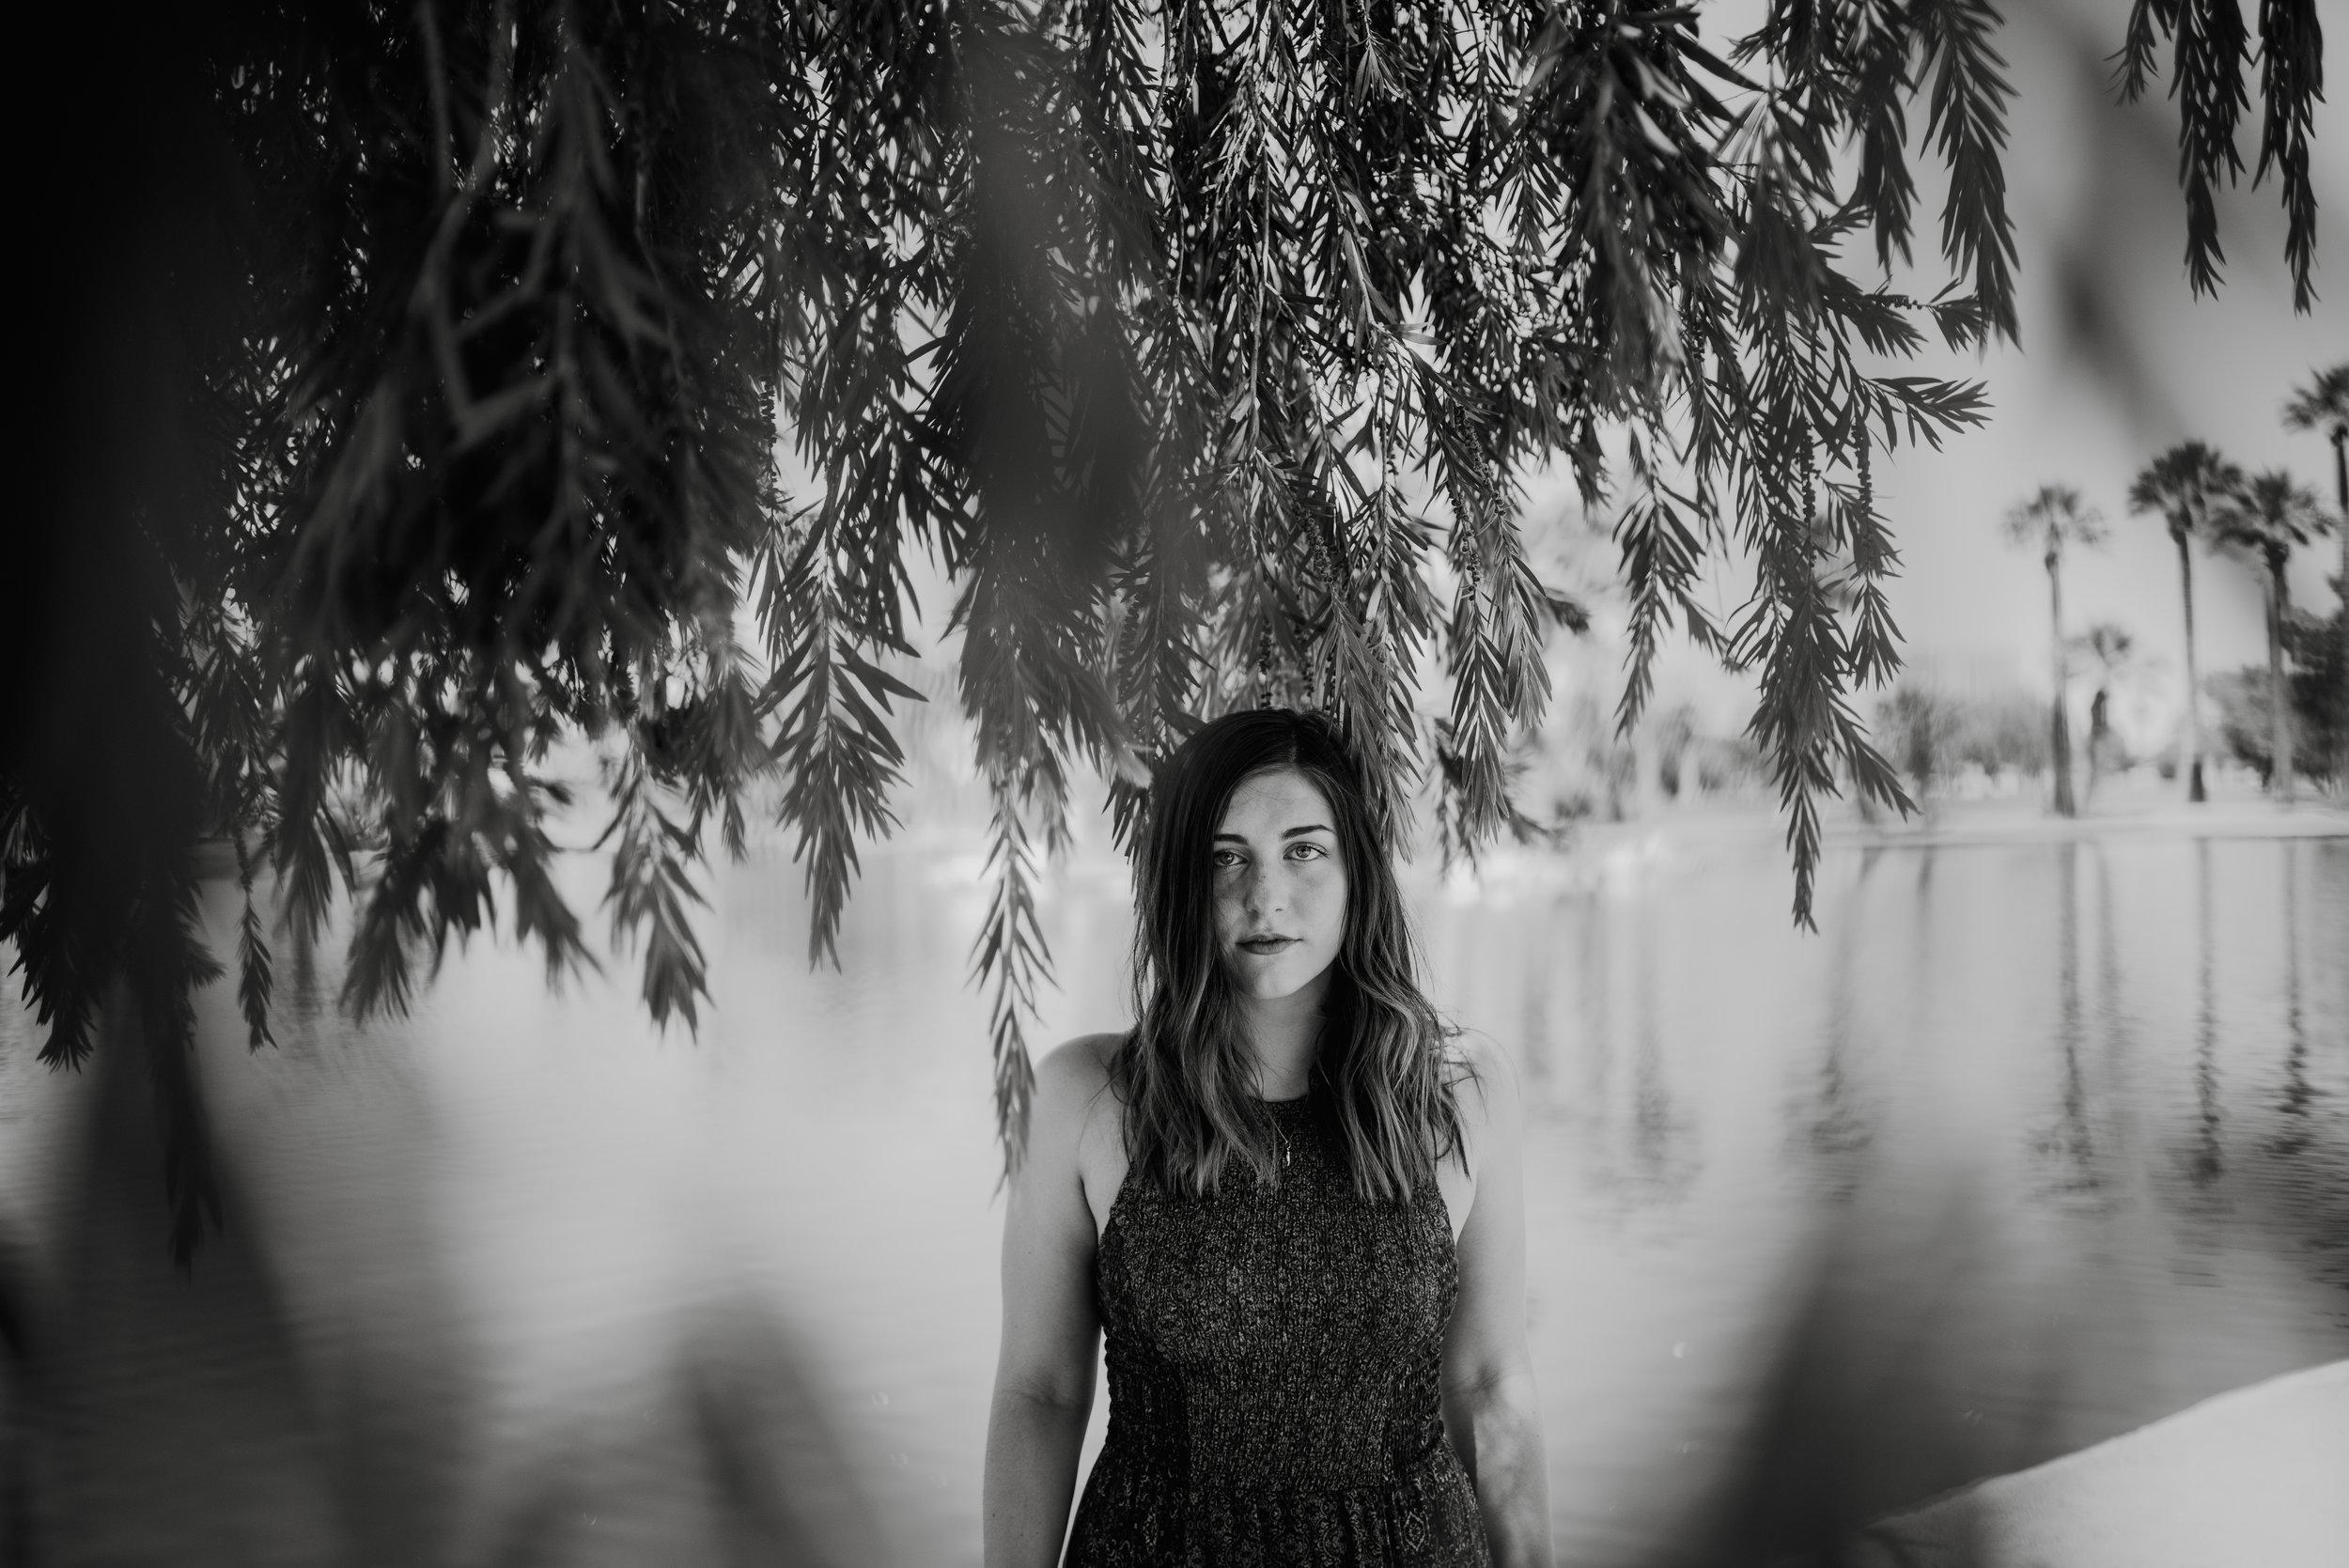 EmilyKidd_PhoenixArizona_June2018_Senior Photography In Phoenix Arizona_ArizonaSeniorPhotographer_SamanthaRosePhotography_BLOG_044.JPG